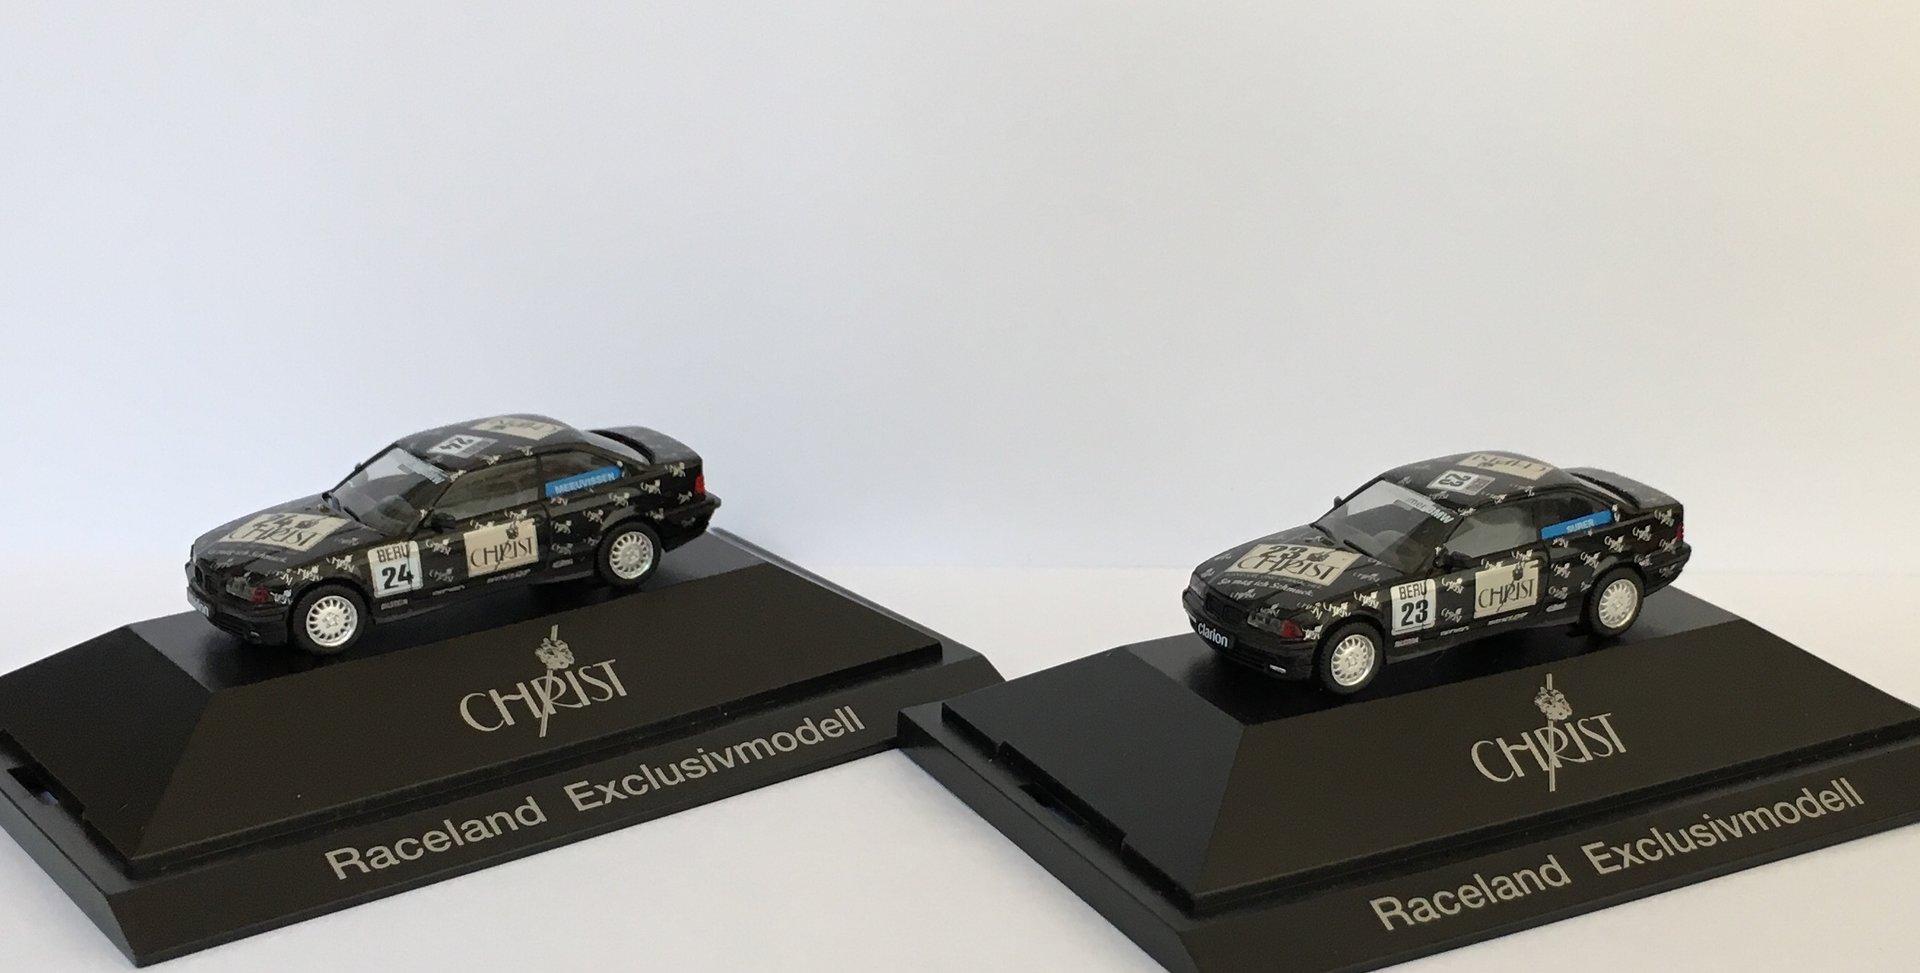 BMW E36 Christ razem.jpg